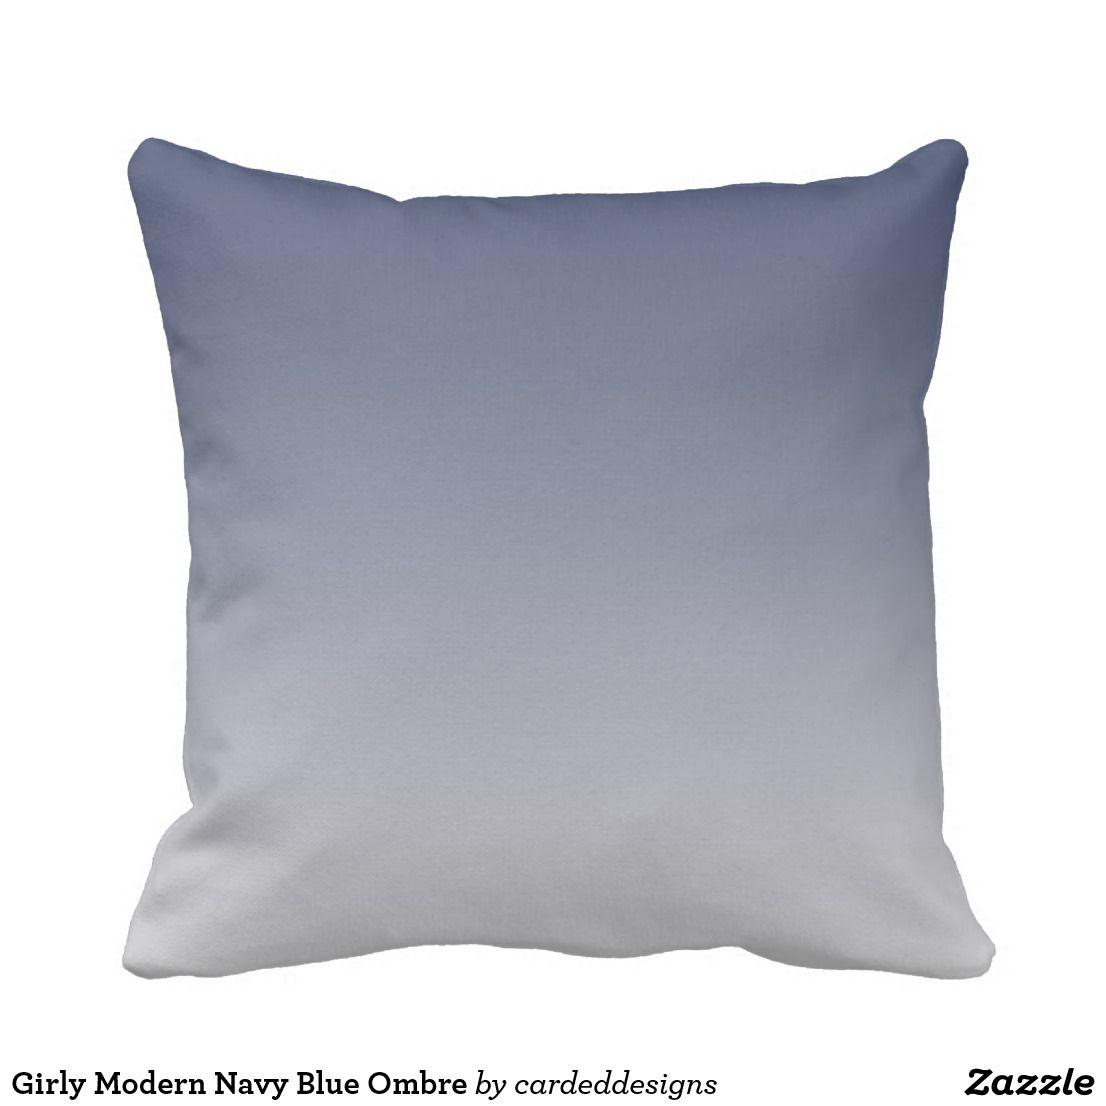 Girly Modern Navy Blue Ombre Throw Pillow